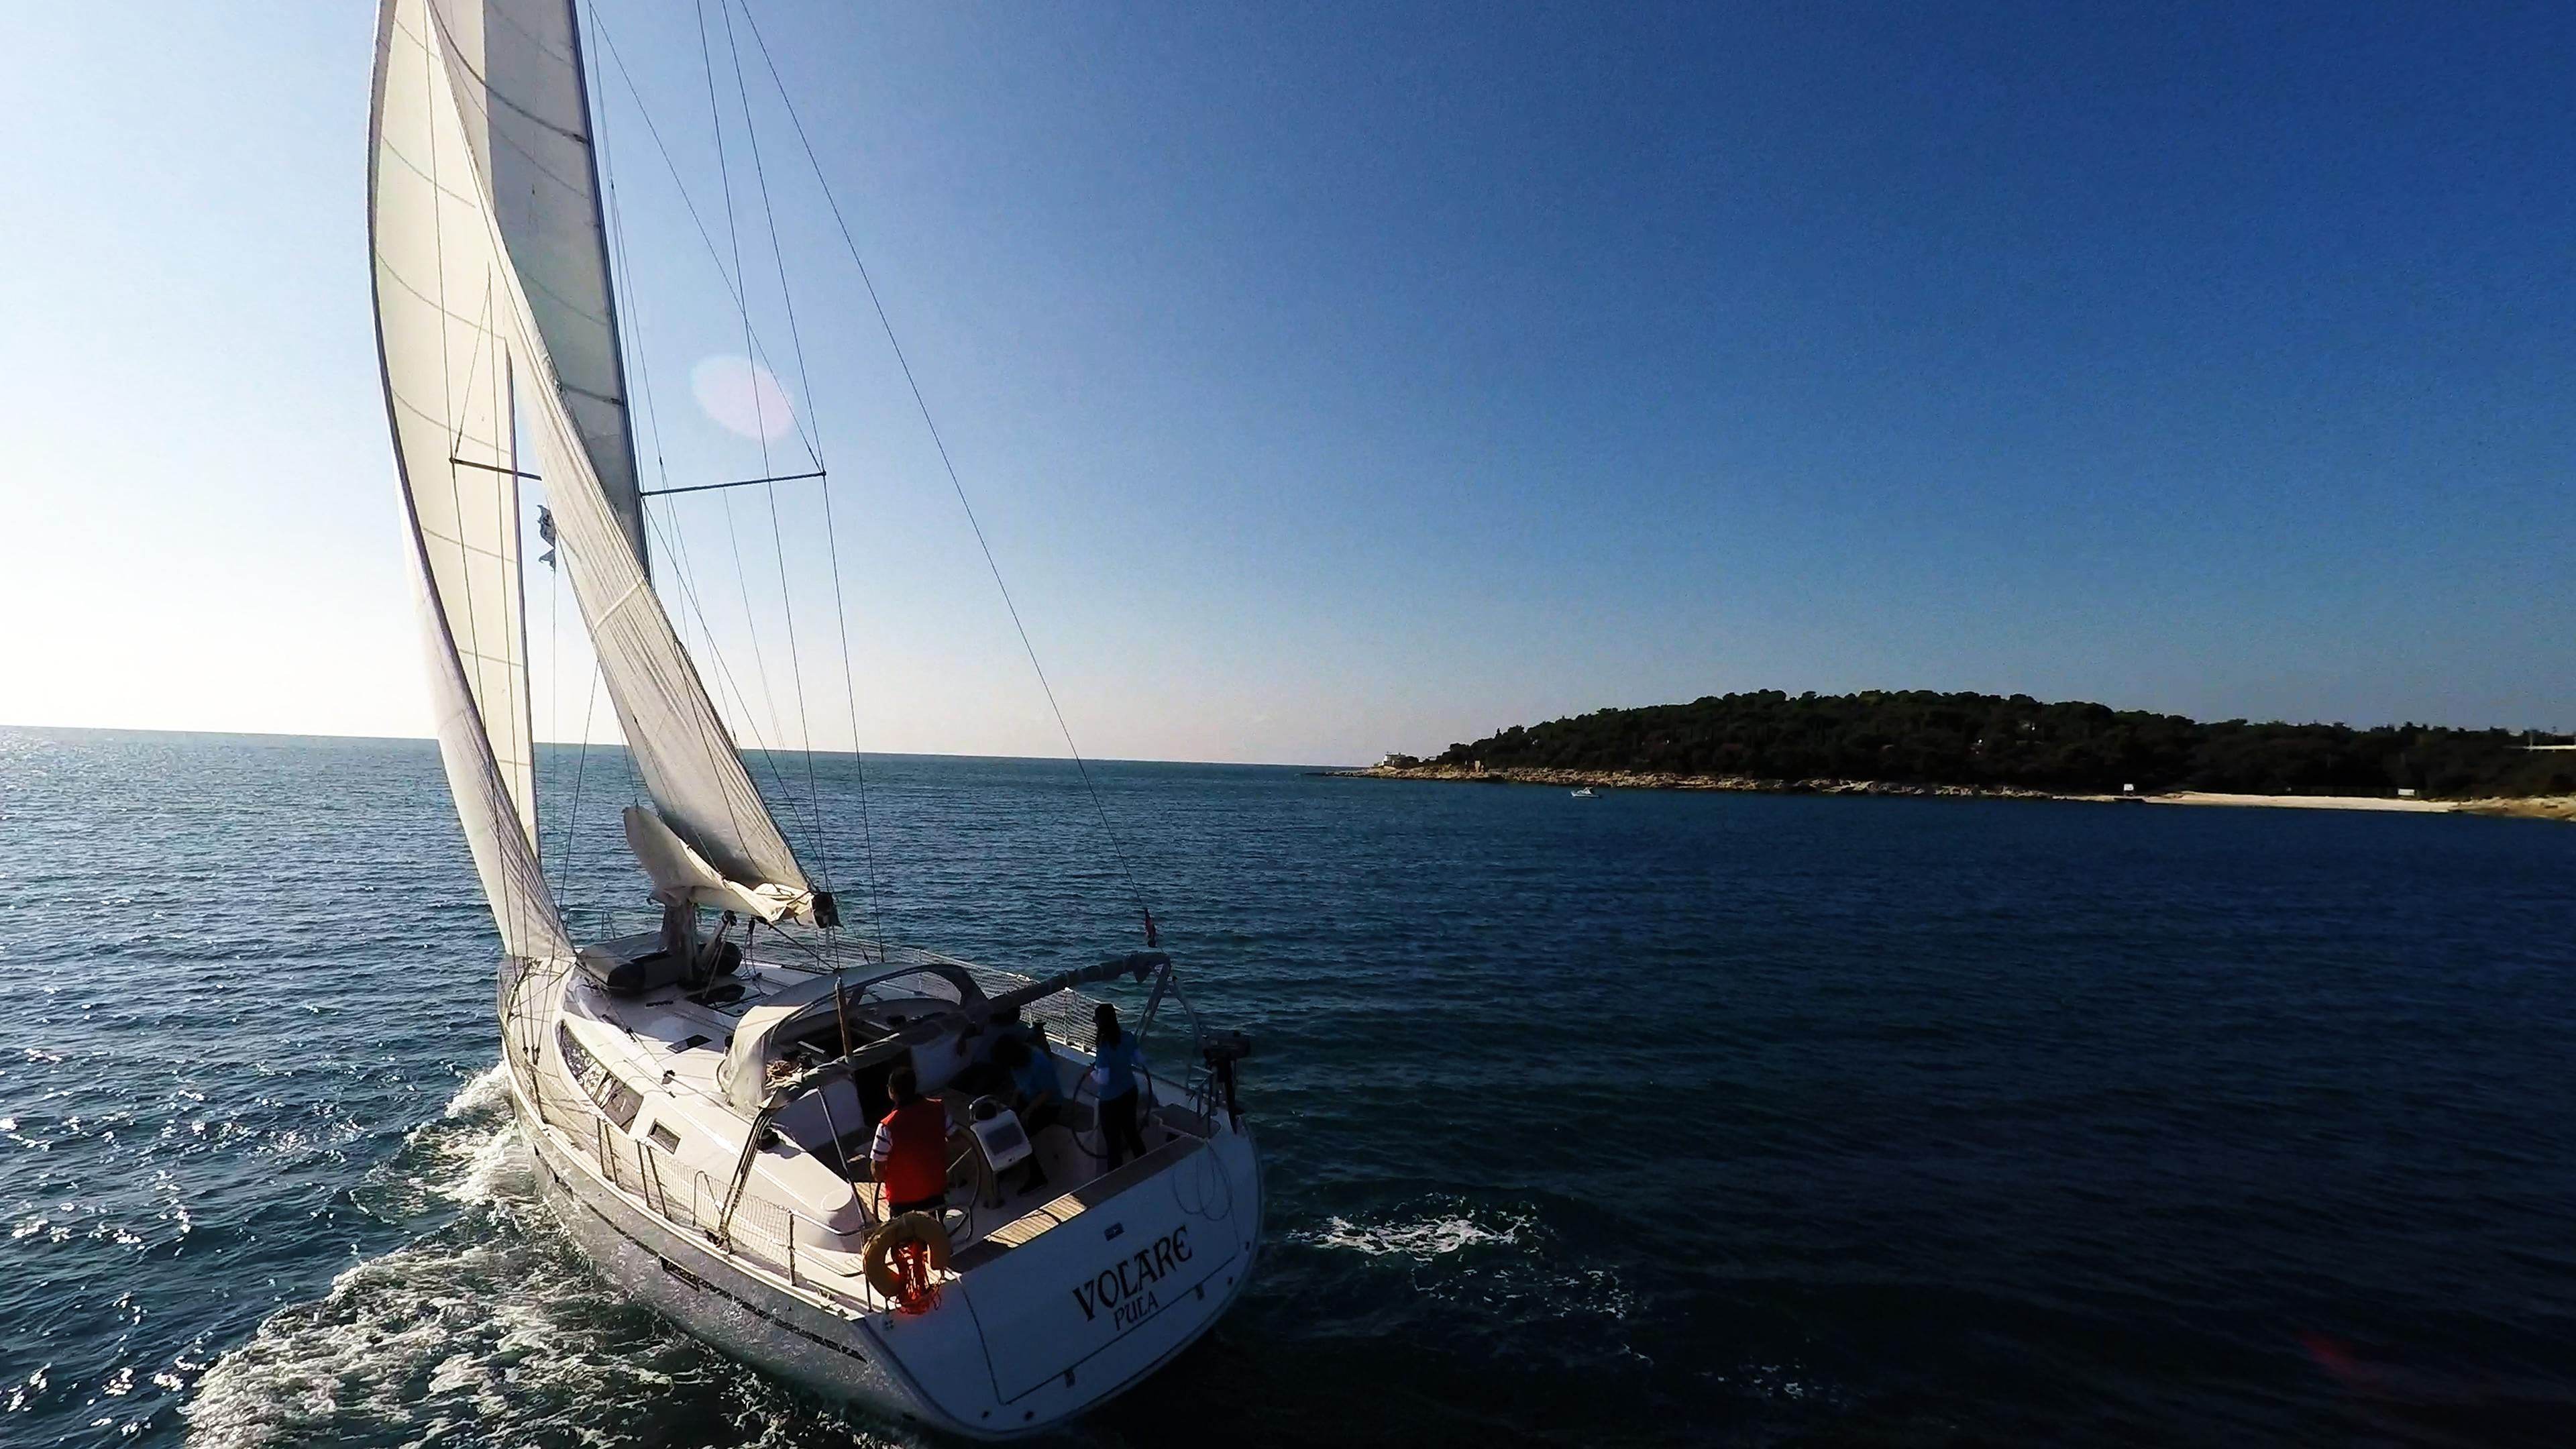 sailing yacht sails bavaria 46 cruiser sailing yacht sun blue sky